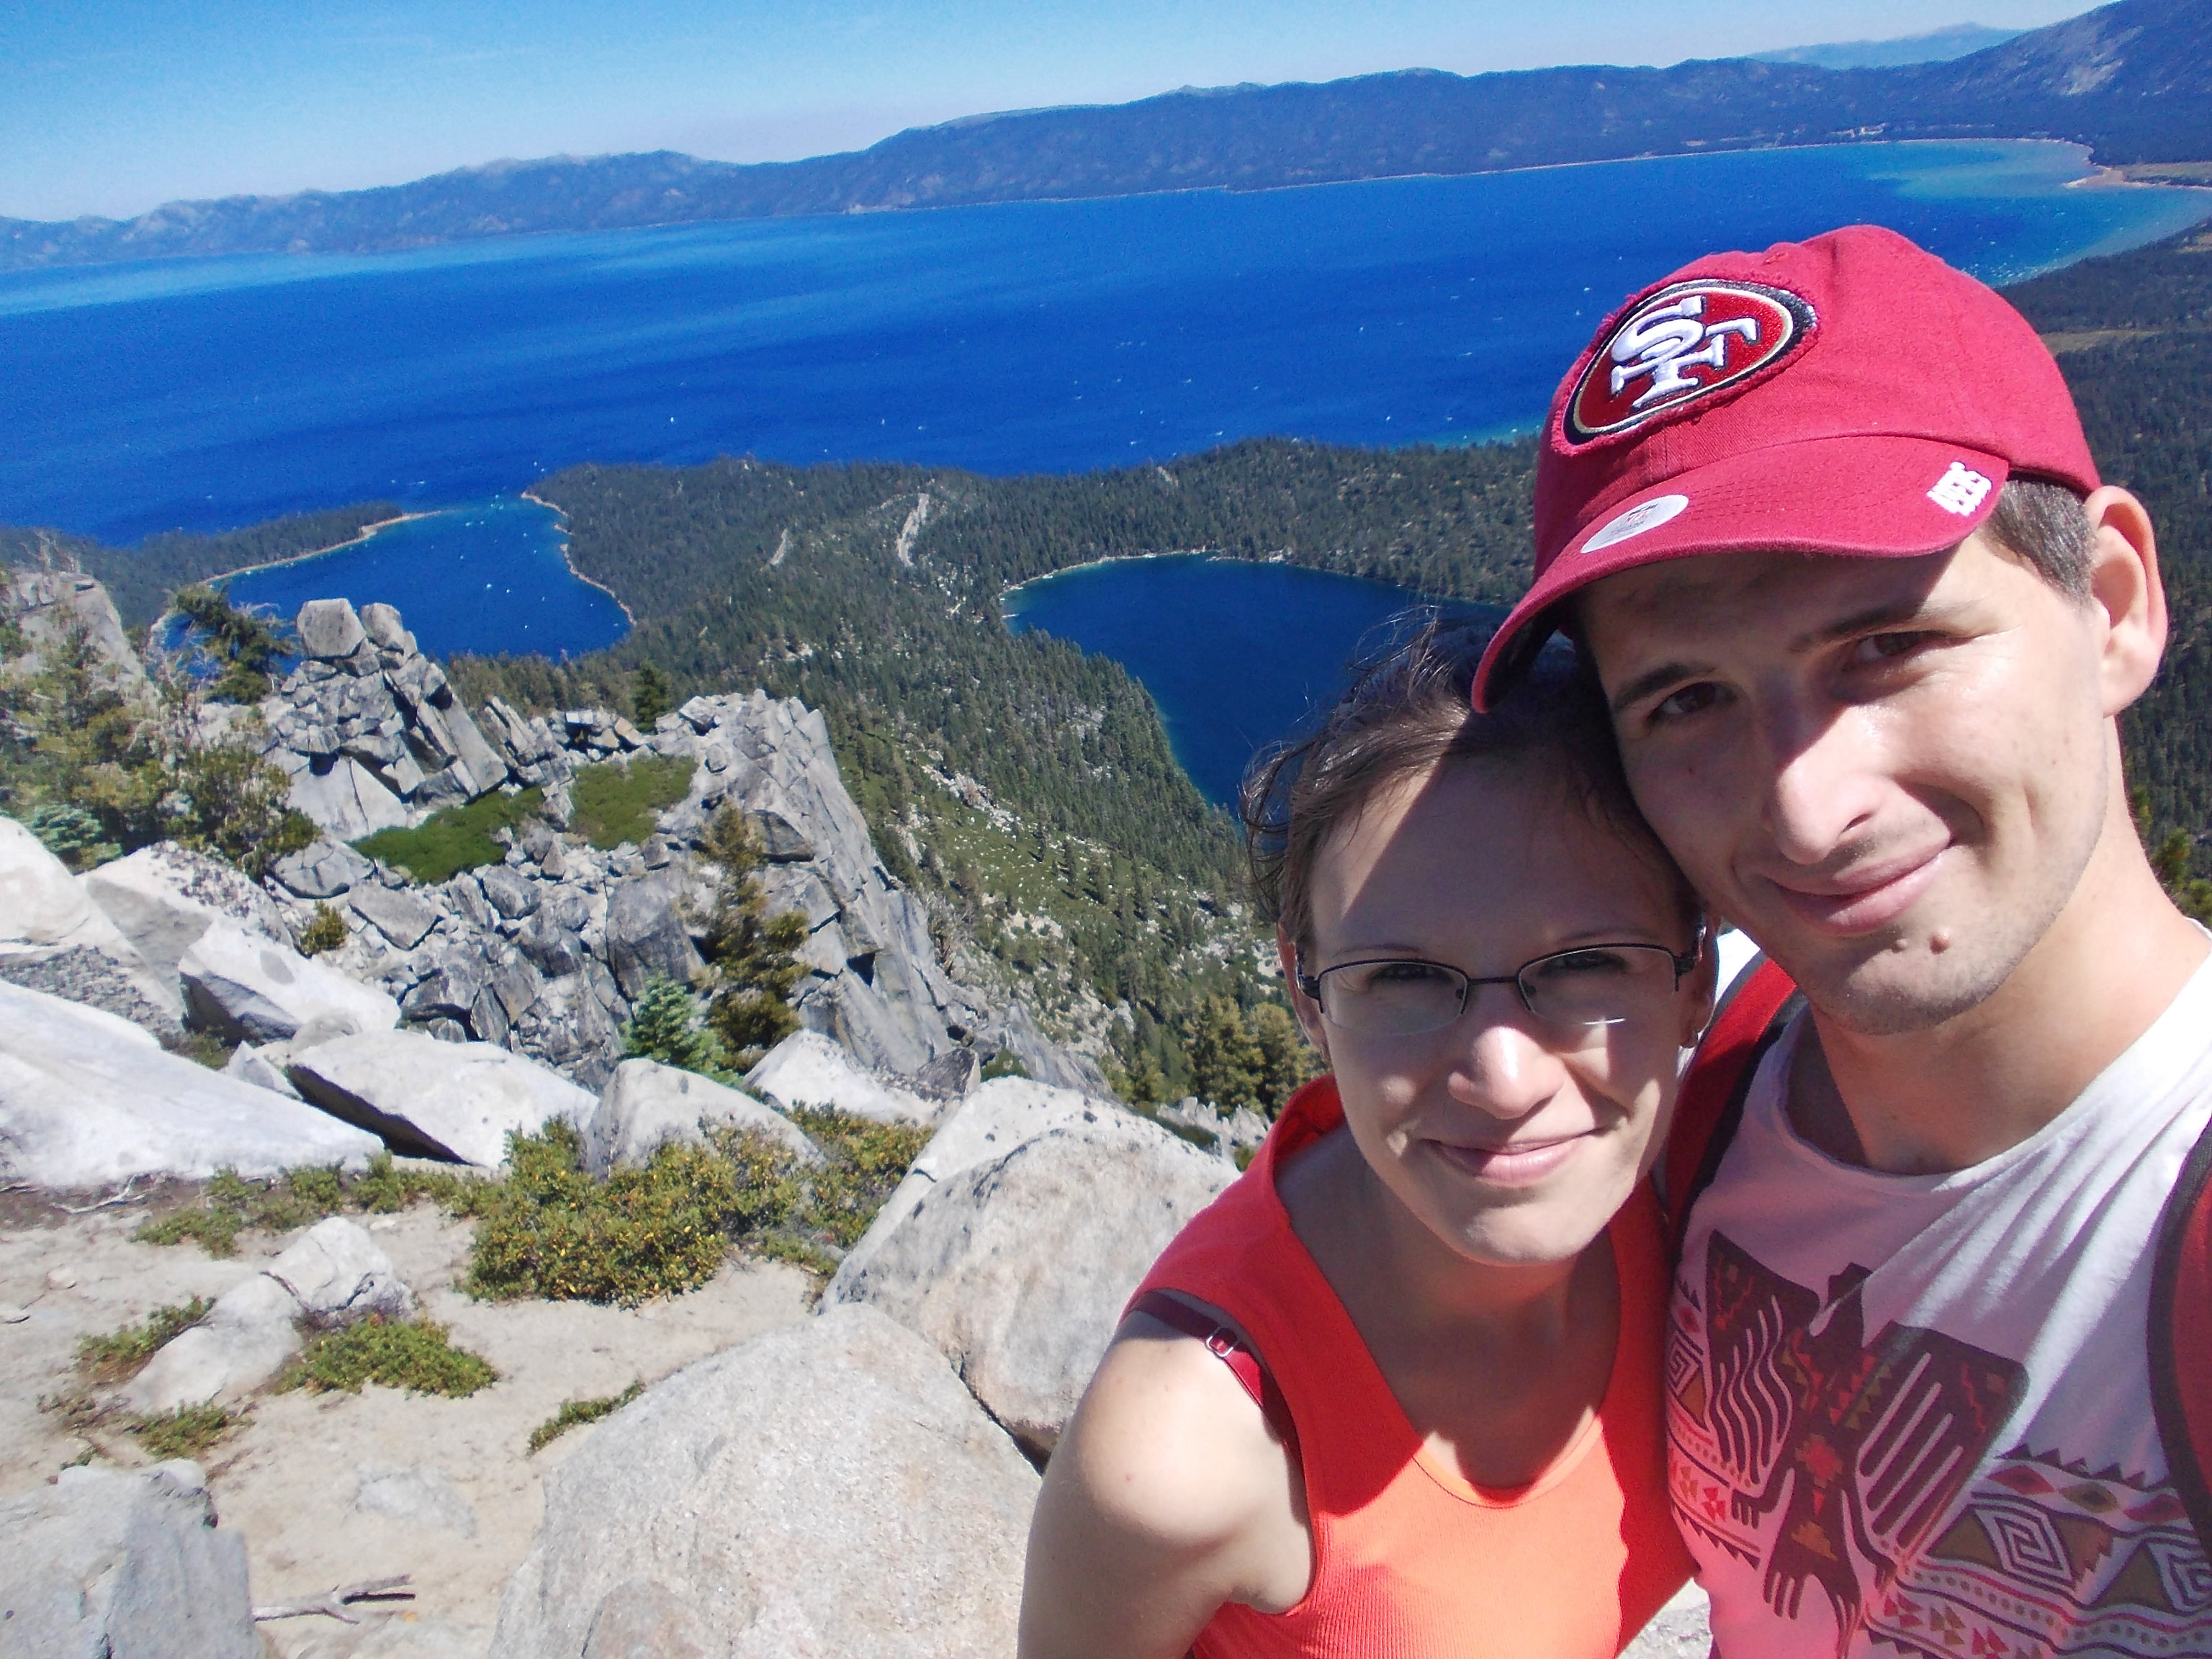 Maggie Peaks, Lake Tahoe, California, USA